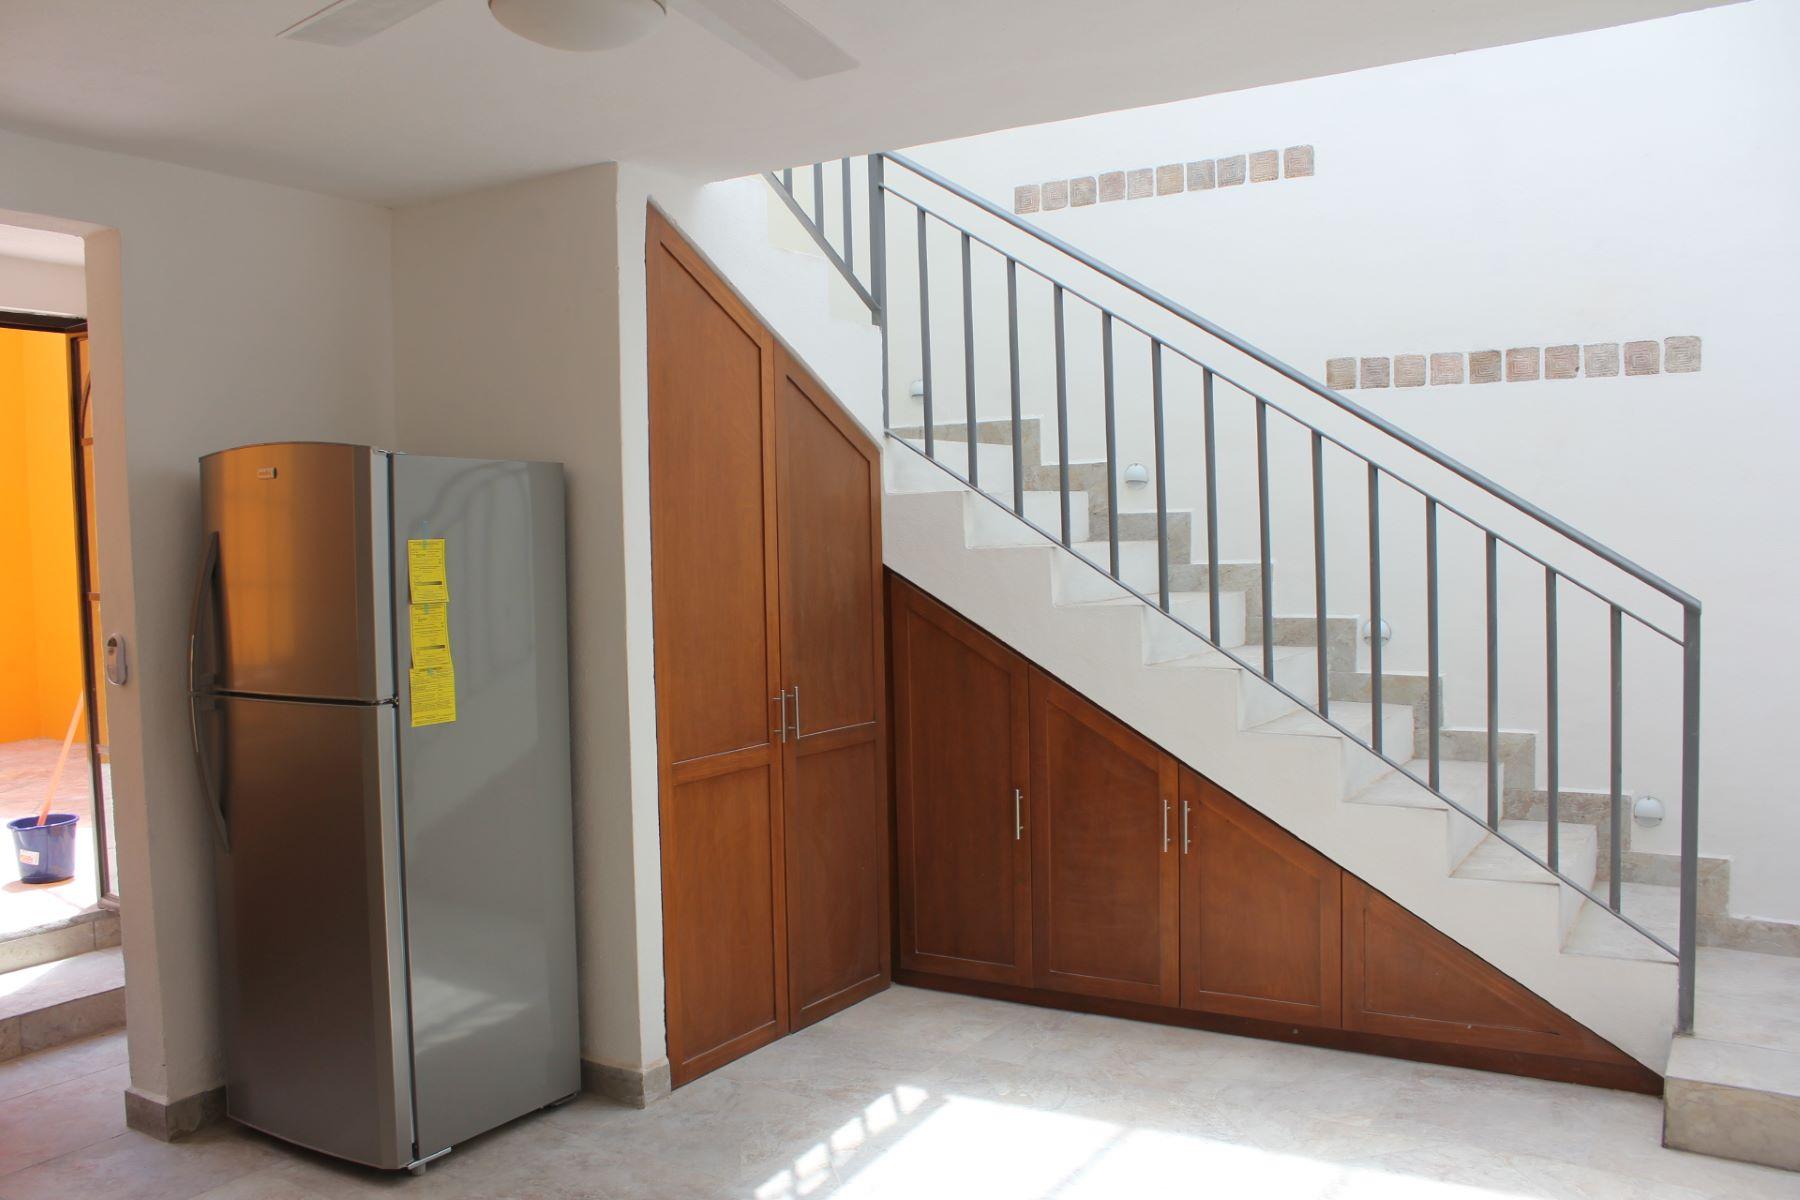 Additional photo for property listing at Casa San Jorge San Antonio, San Miguel De Allende, Guanajuato Mexico